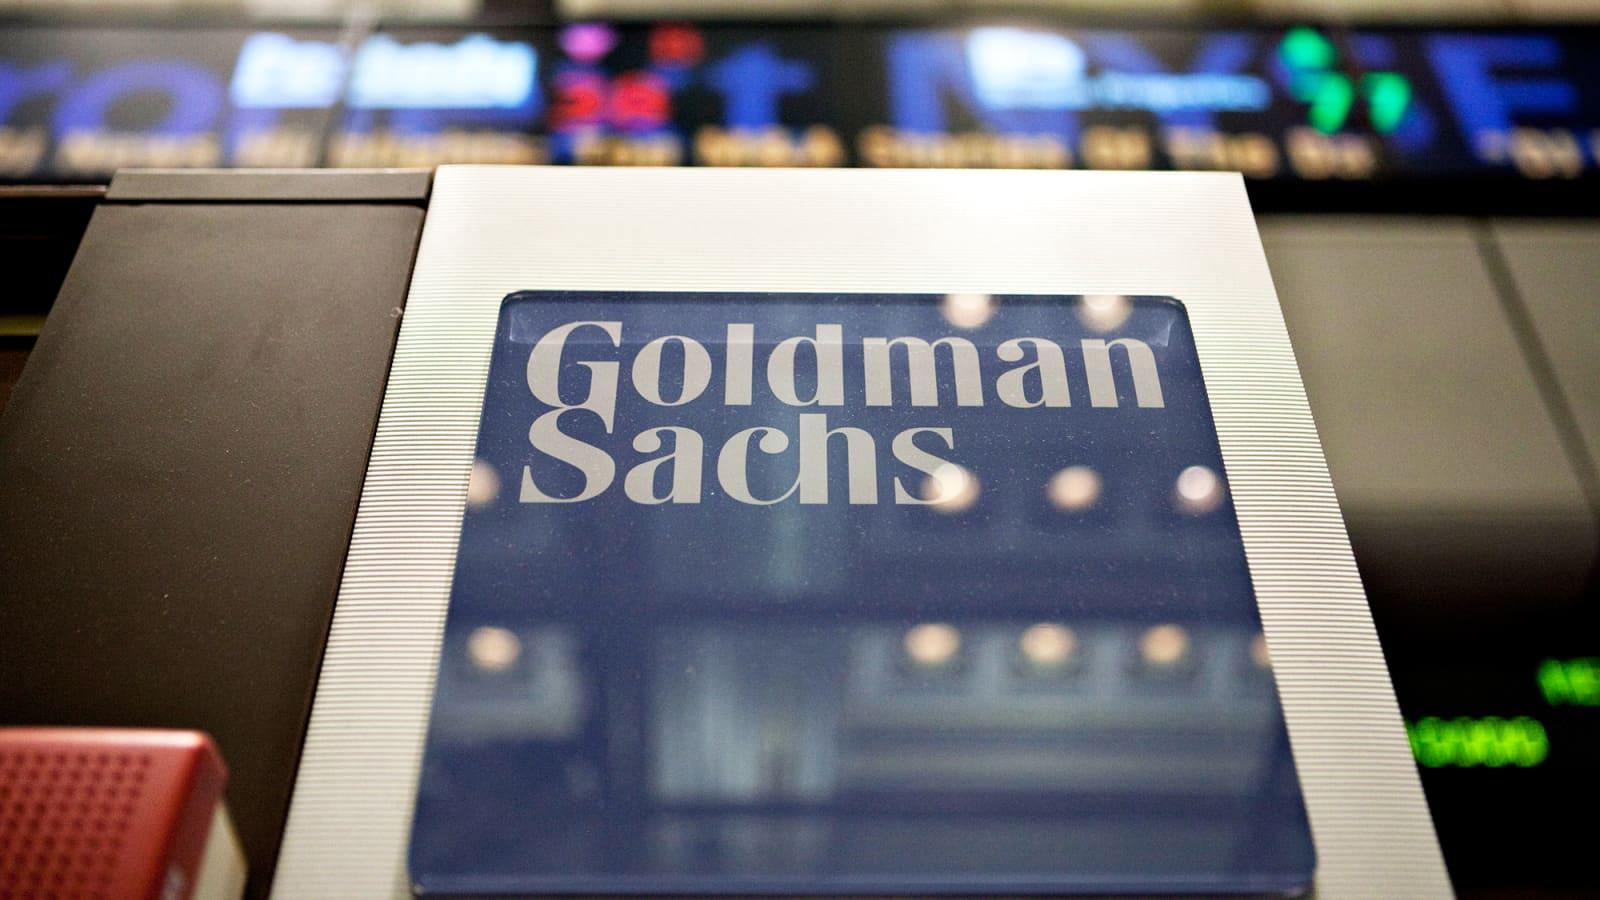 goldman sachs bitcoin prekybos stalas